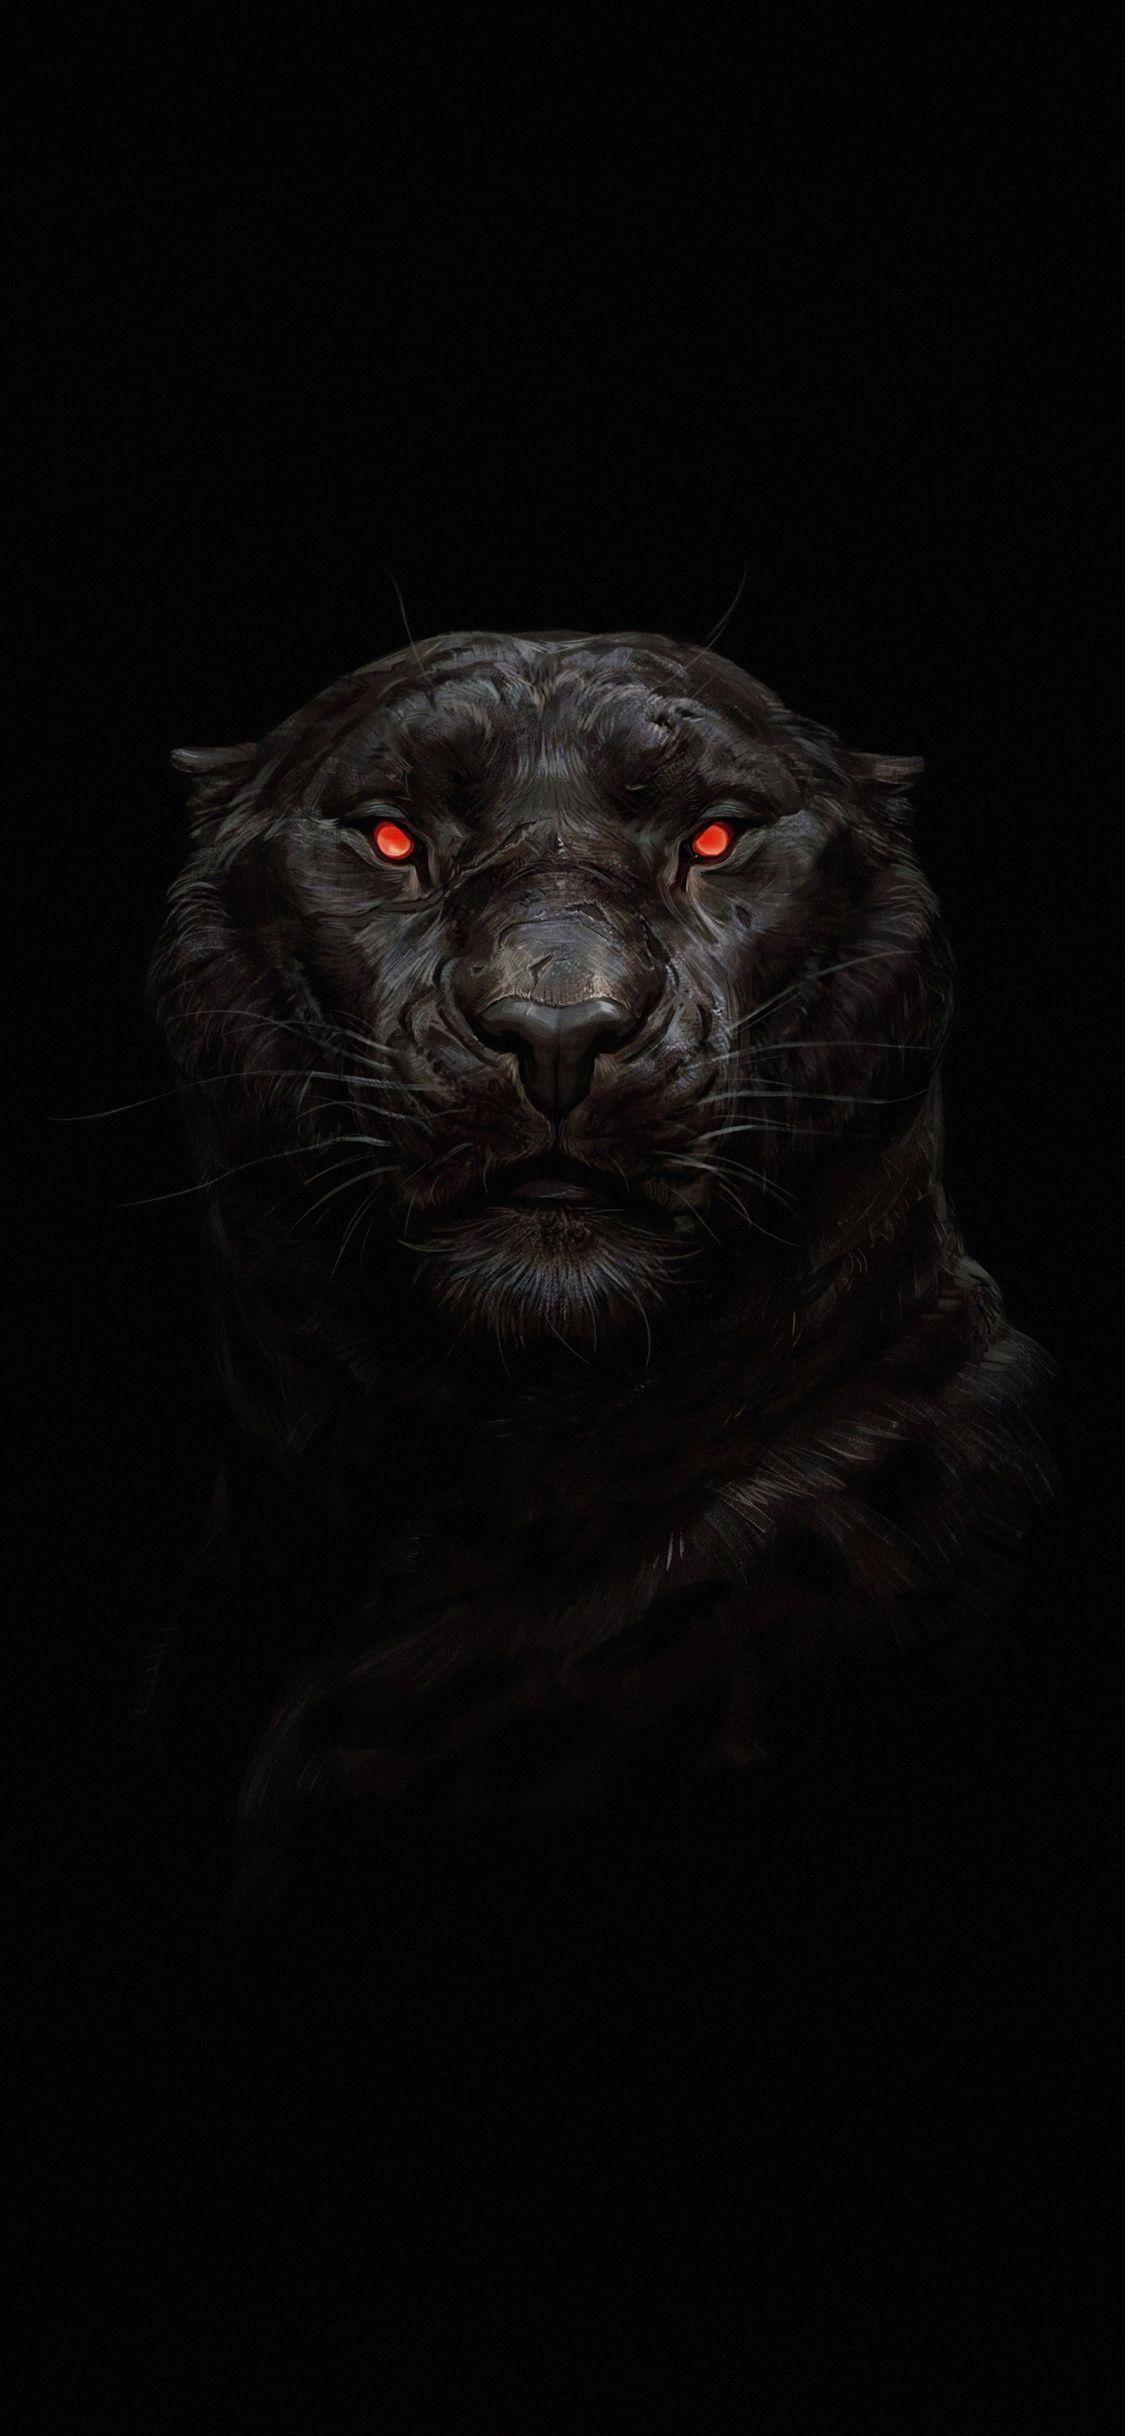 1125x2436 Tiger Glowing Red Eyes Predator Dark Wallpaper Darkwallpaperiphone 1125x2436 Tiger Dark Wallpaper Red And Black Wallpaper Dark Wallpaper Iphone